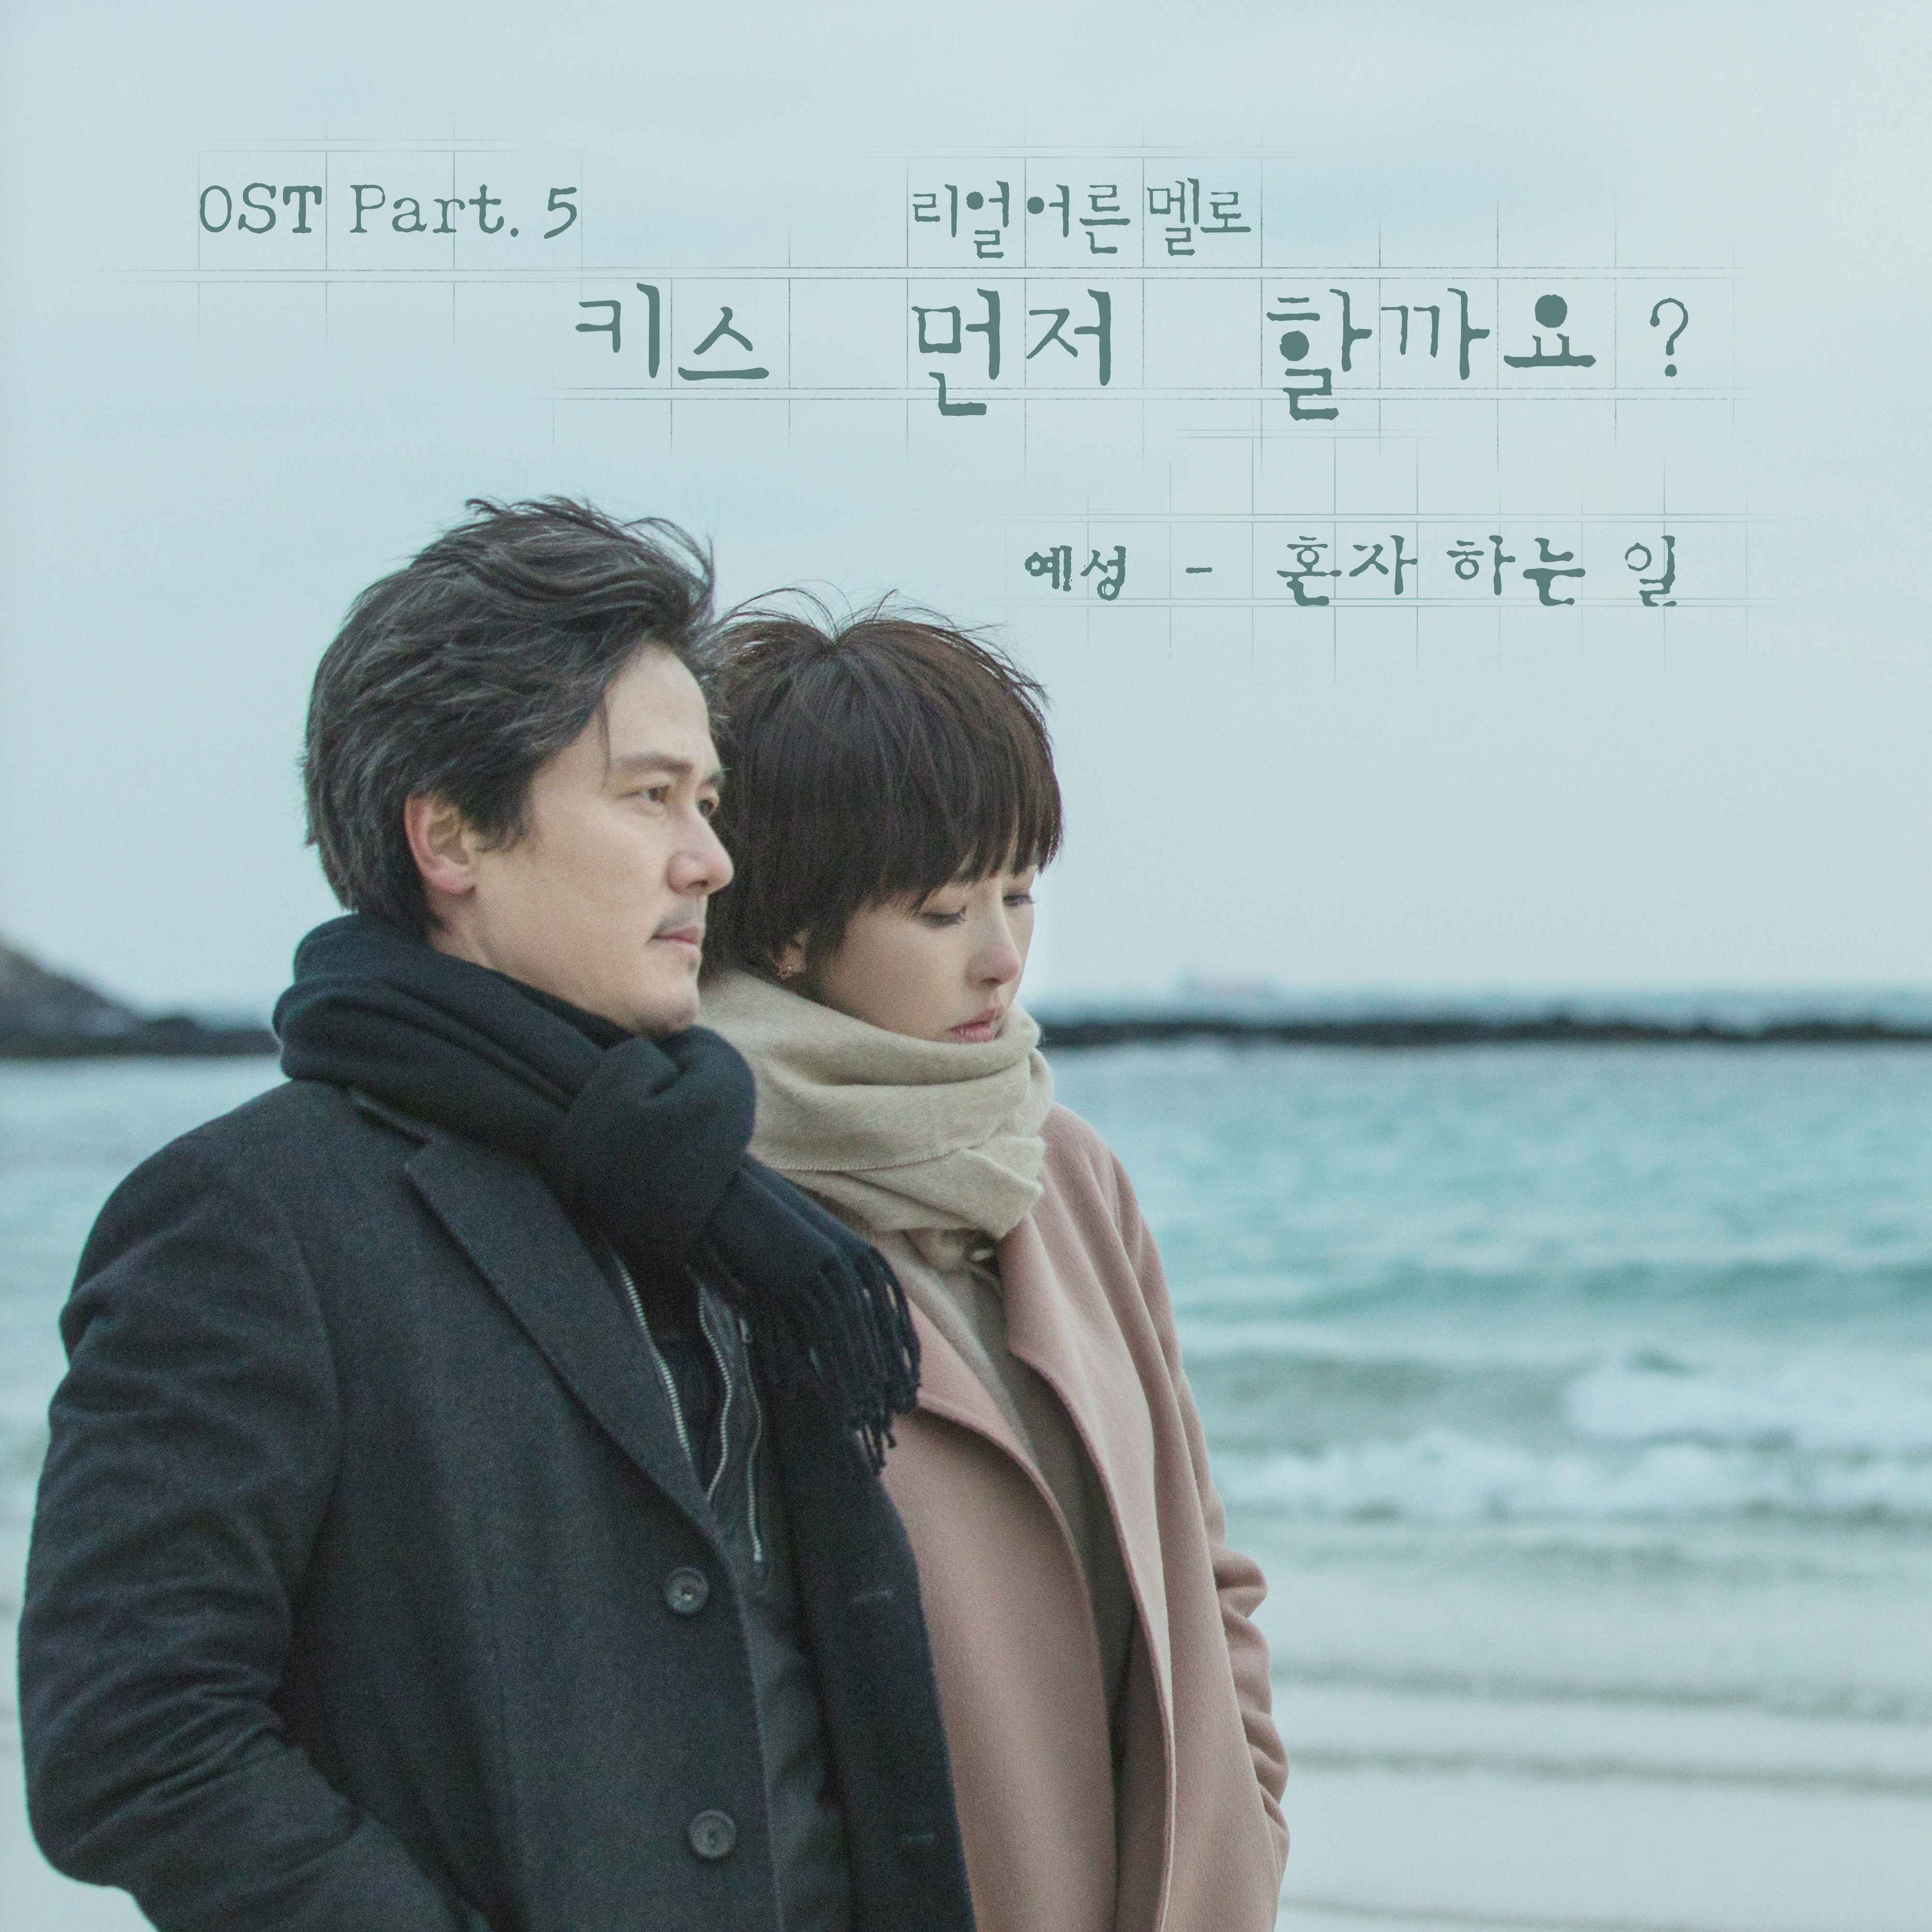 sbs电视台月火剧_SJ艺声参与演唱《要先接吻吗?》全新OST